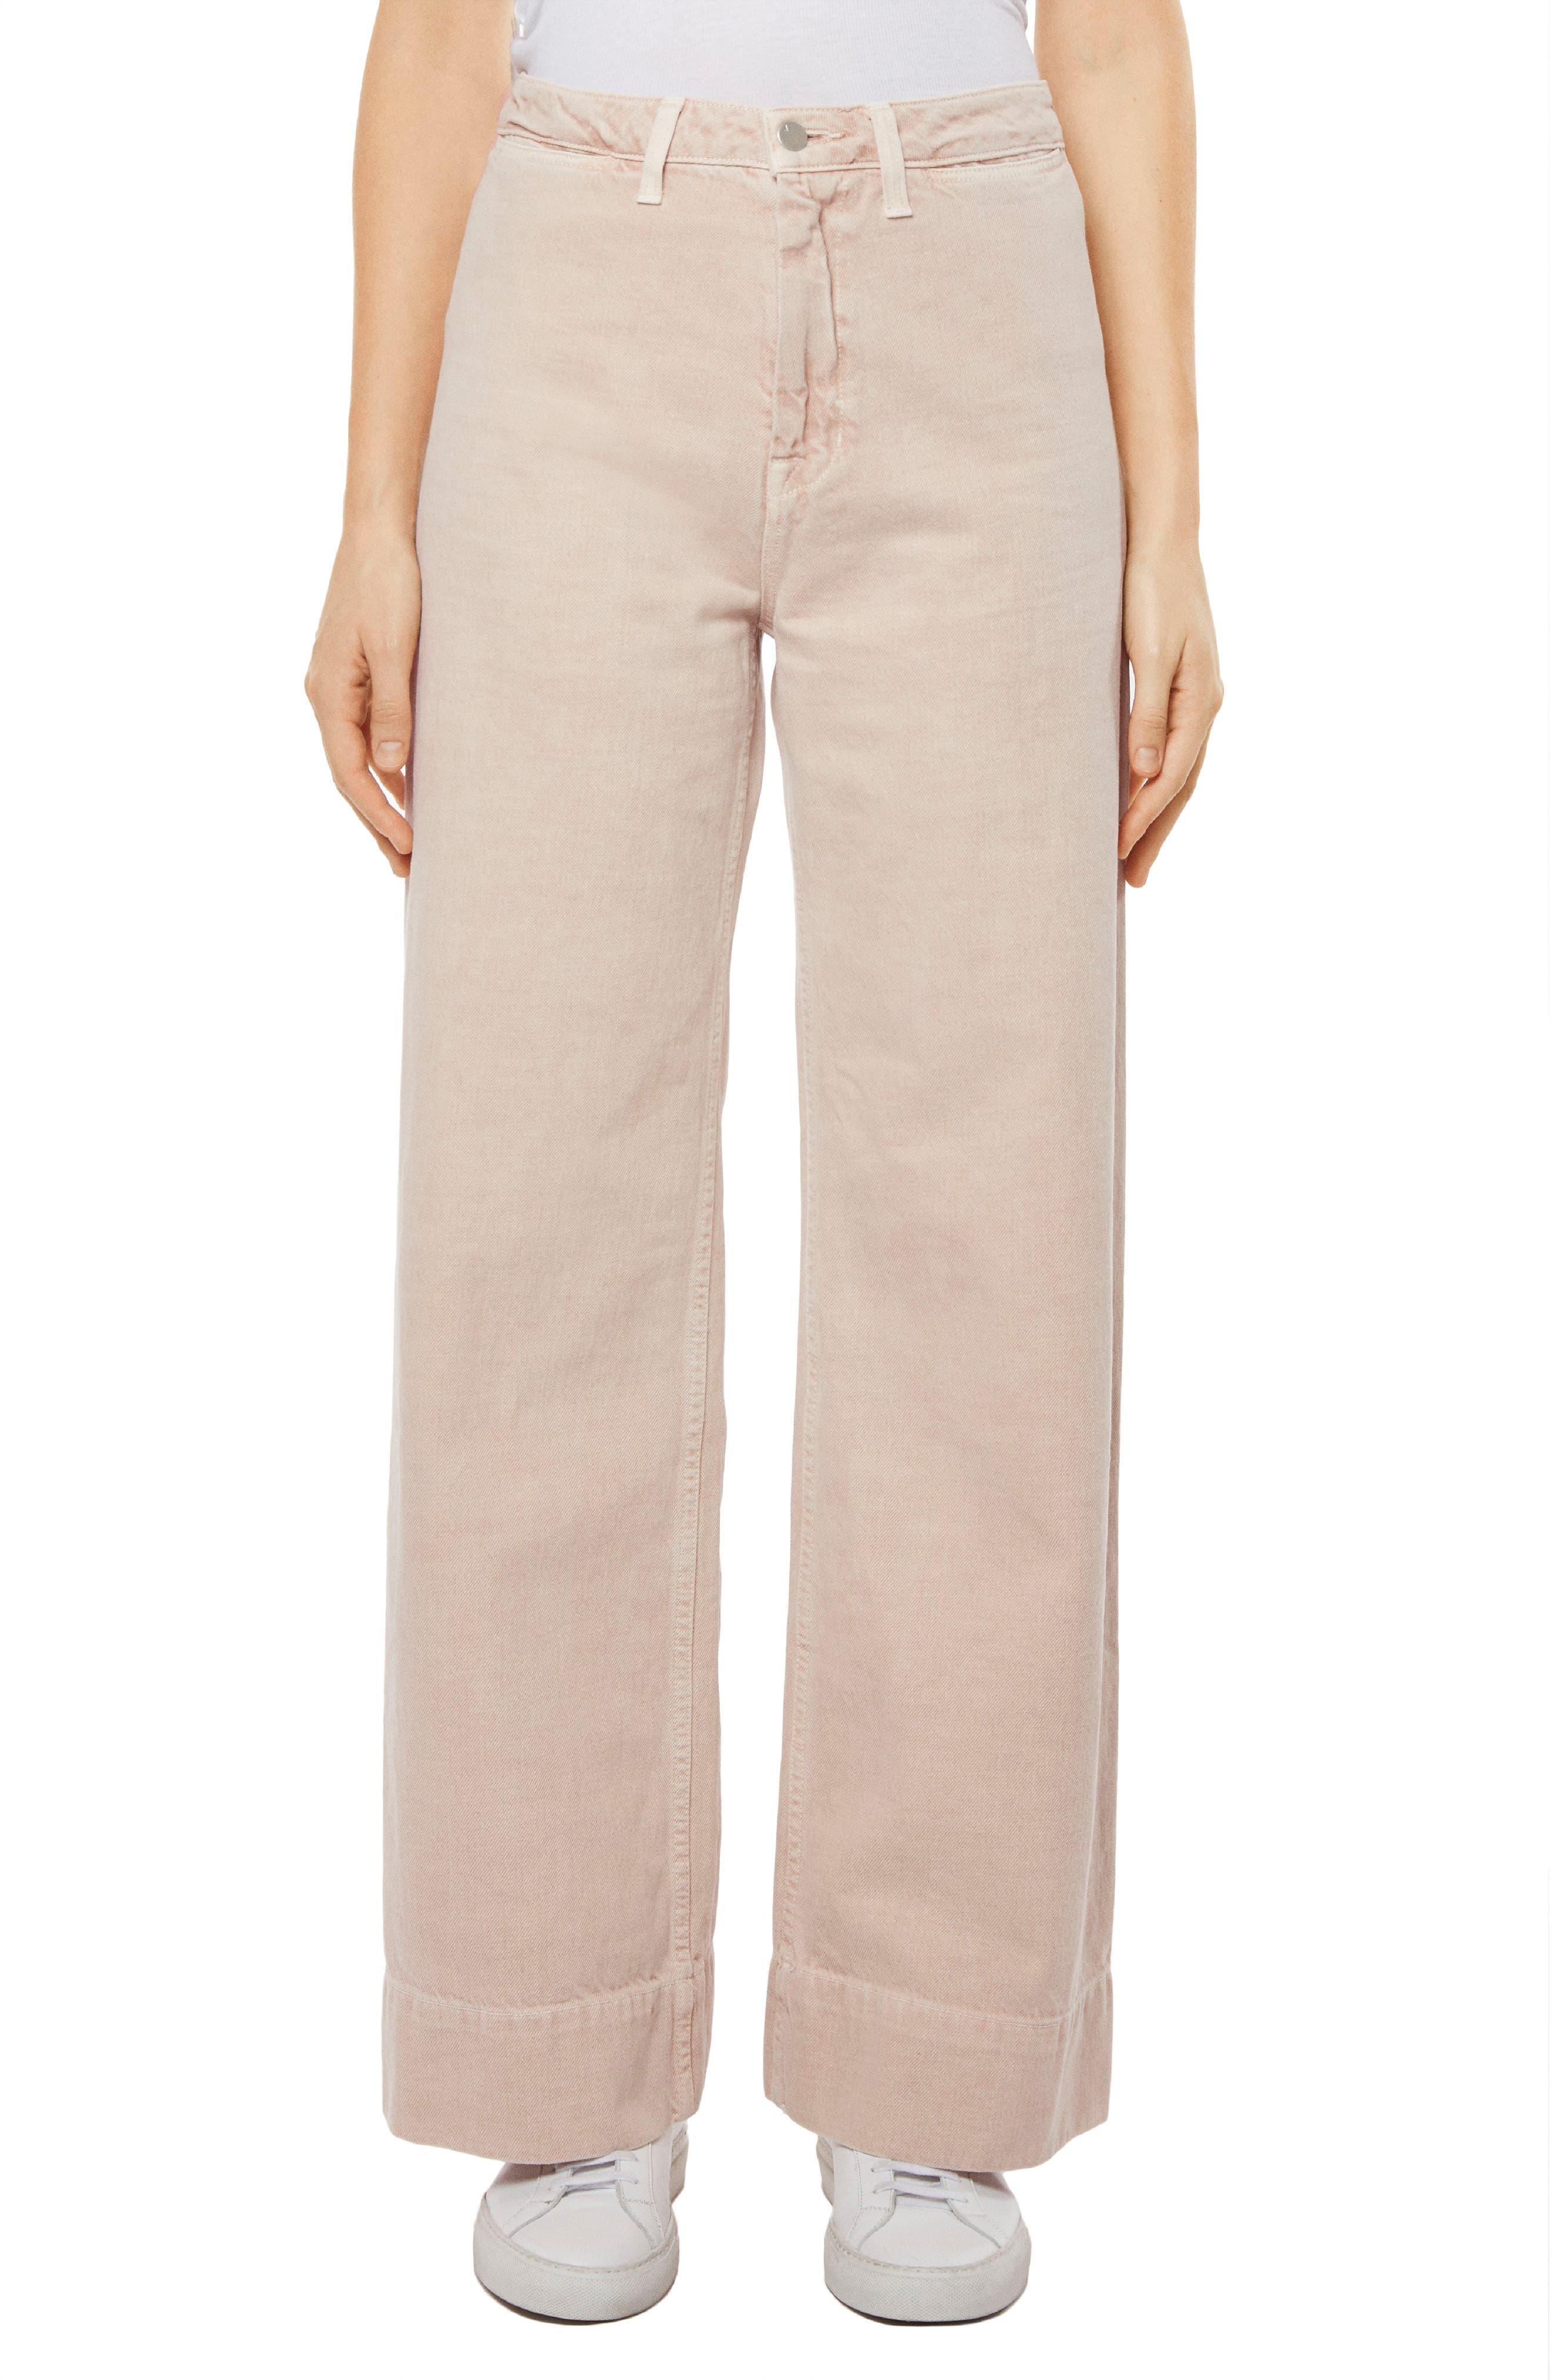 Hallton High Waist Wide Leg Jeans,                         Main,                         color, Memory